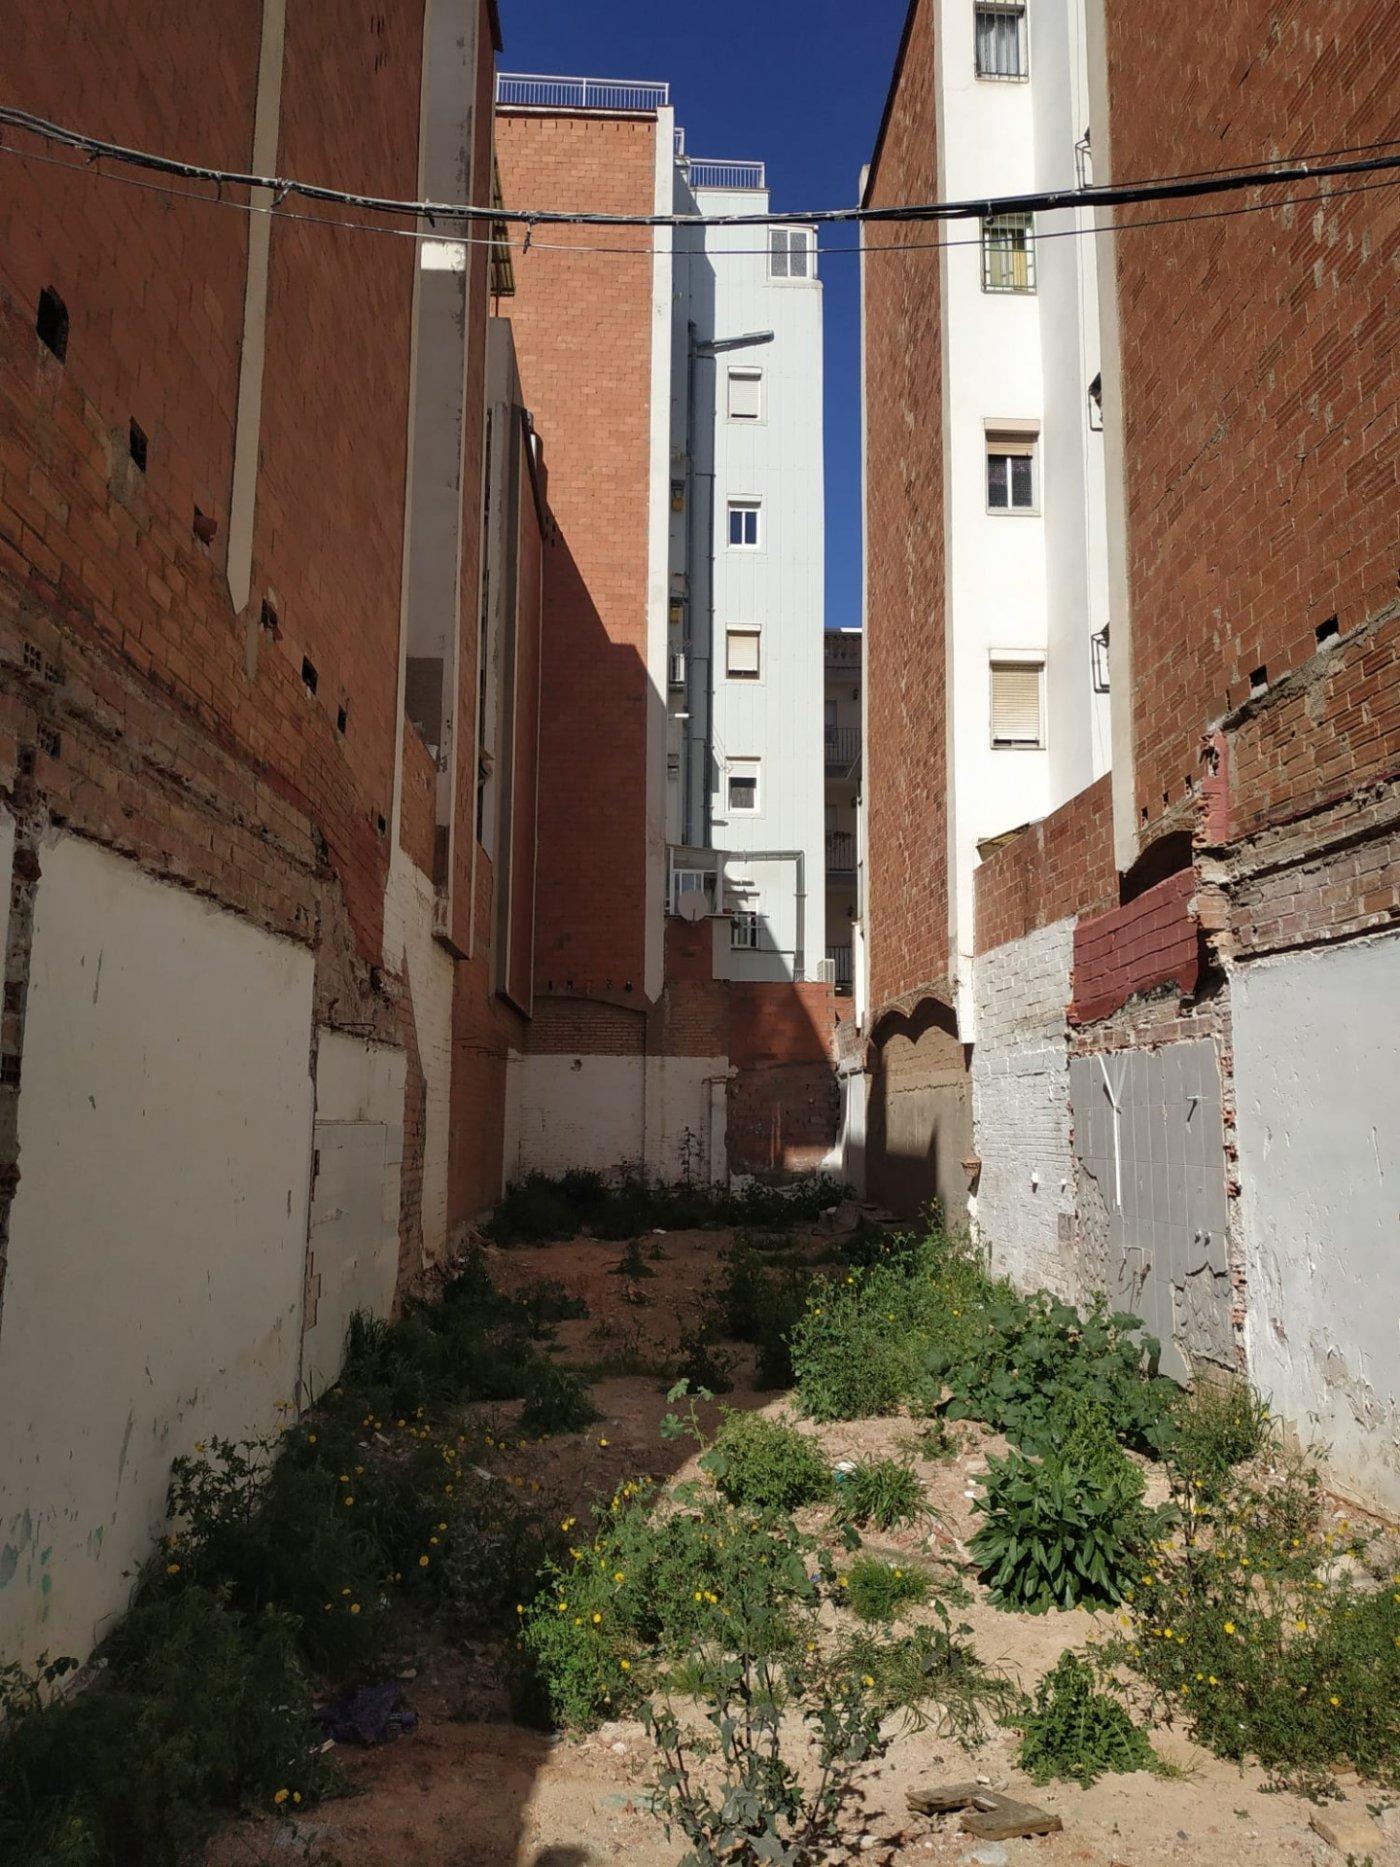 Solar urbano  Hospitalet de llobregat ,sanfeliu. Solar en venta 170 m2